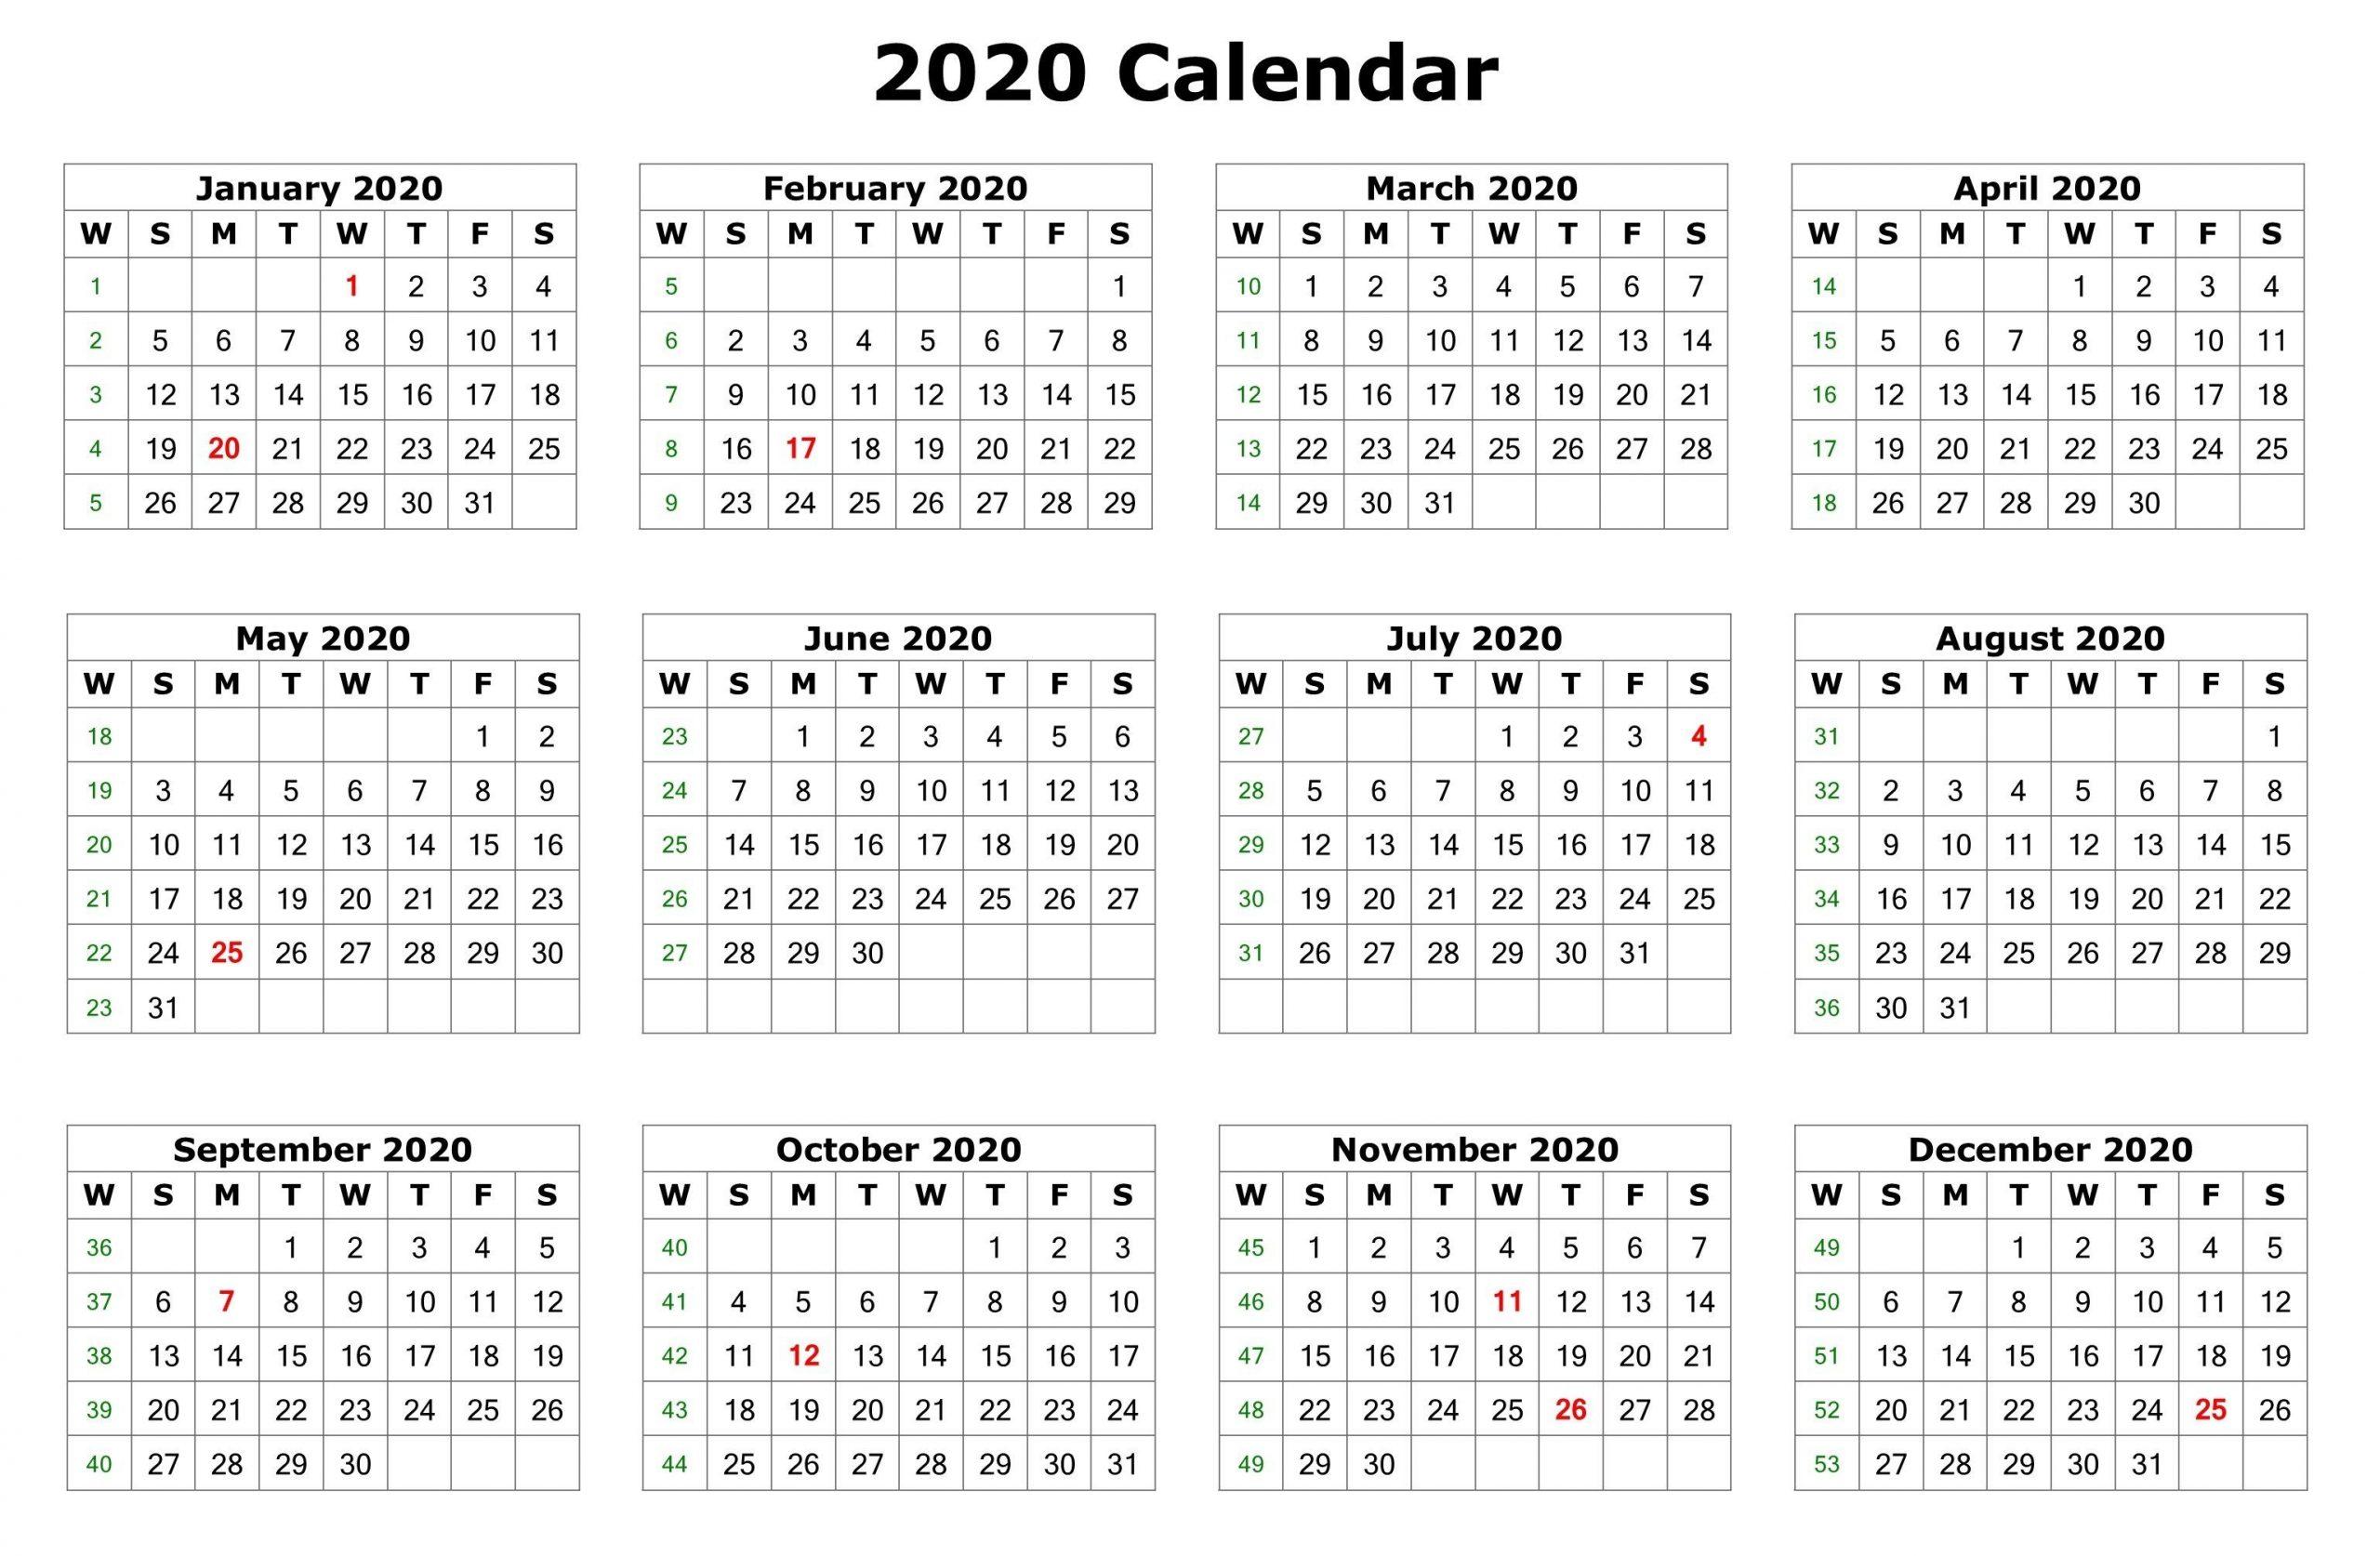 2020 12 Months Calendar Printable | Printable Calendar 2020